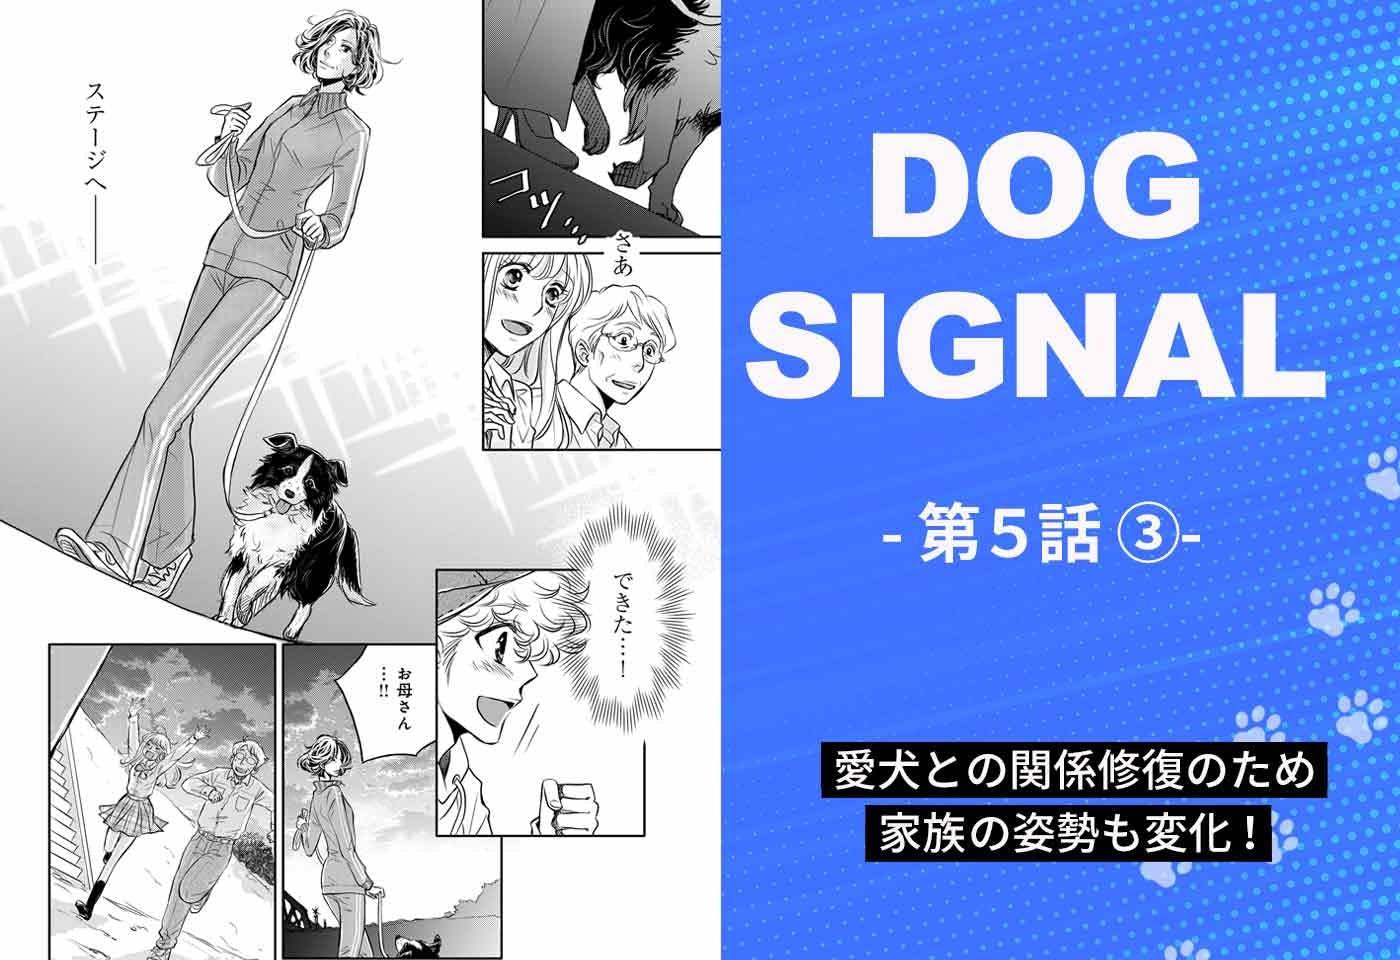 『DOG SIGNAL』5話目 3/4